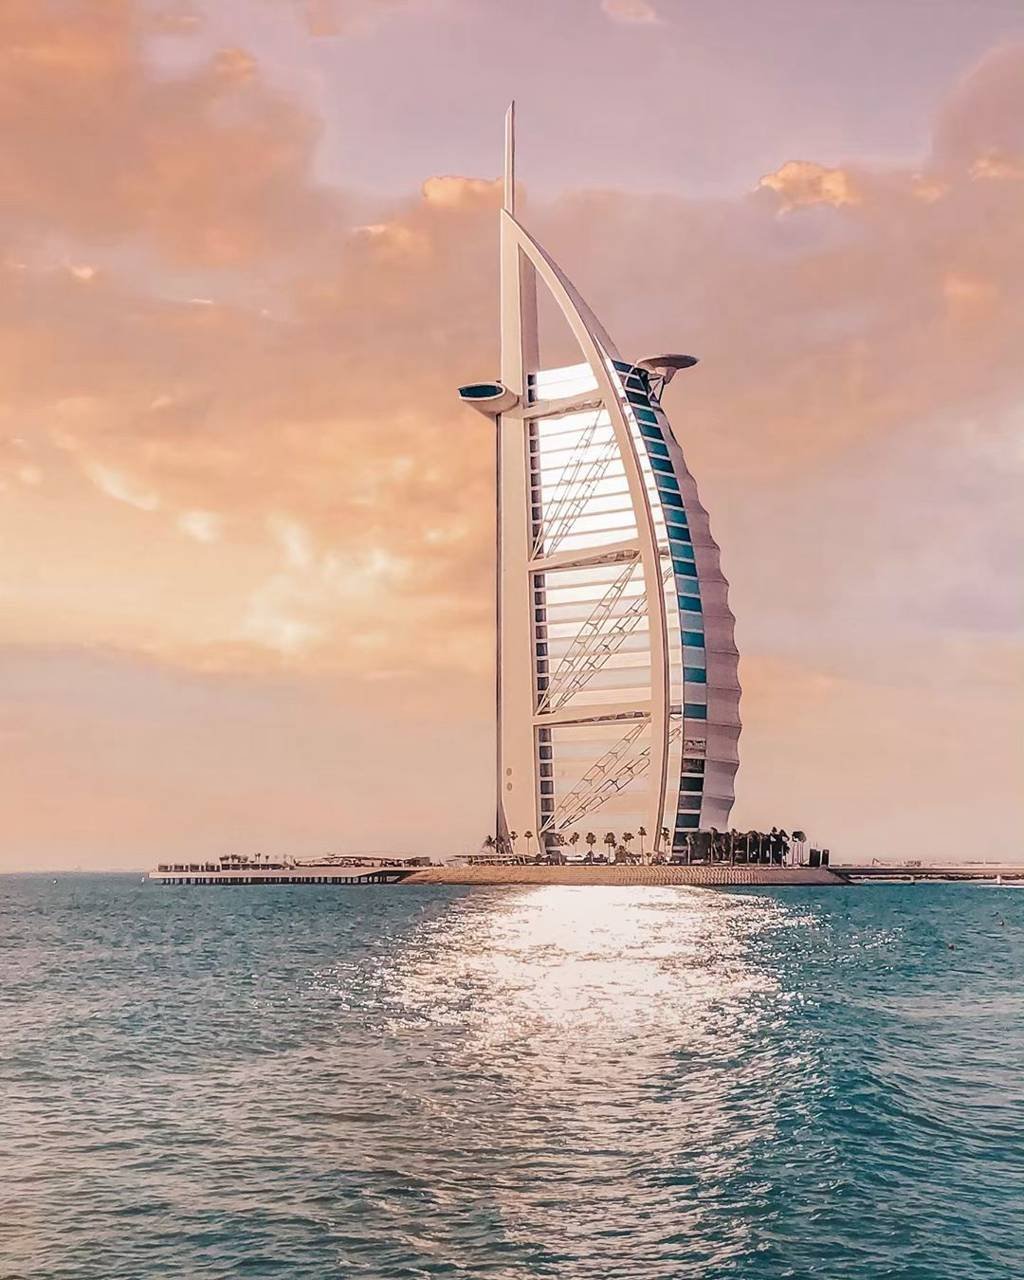 Burj Al Arab Wallpaper By P3tr1t D9 Free On Zedge